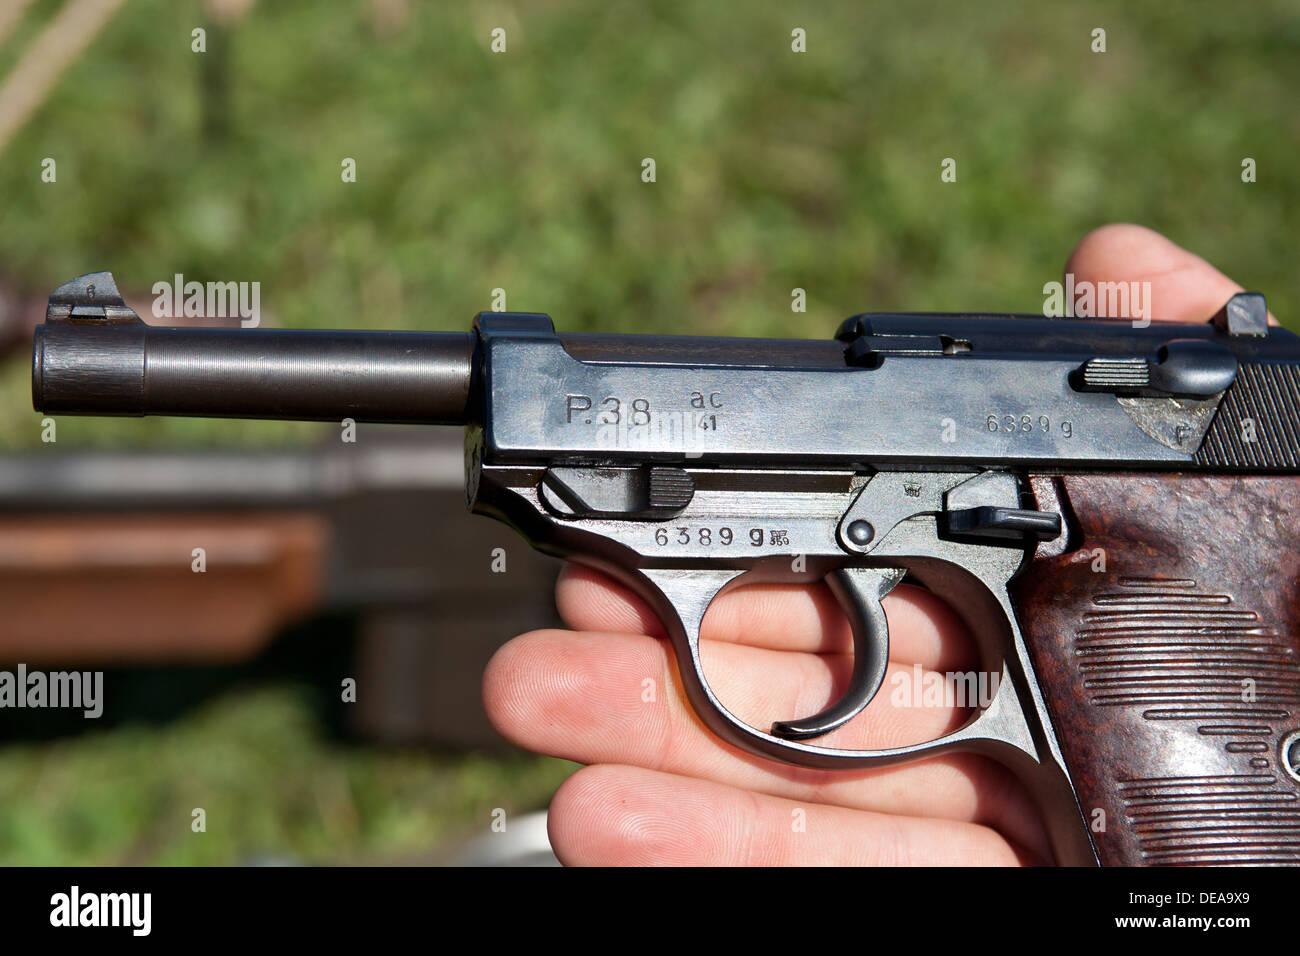 Walther P38 WWII era German handgun - Stock Image